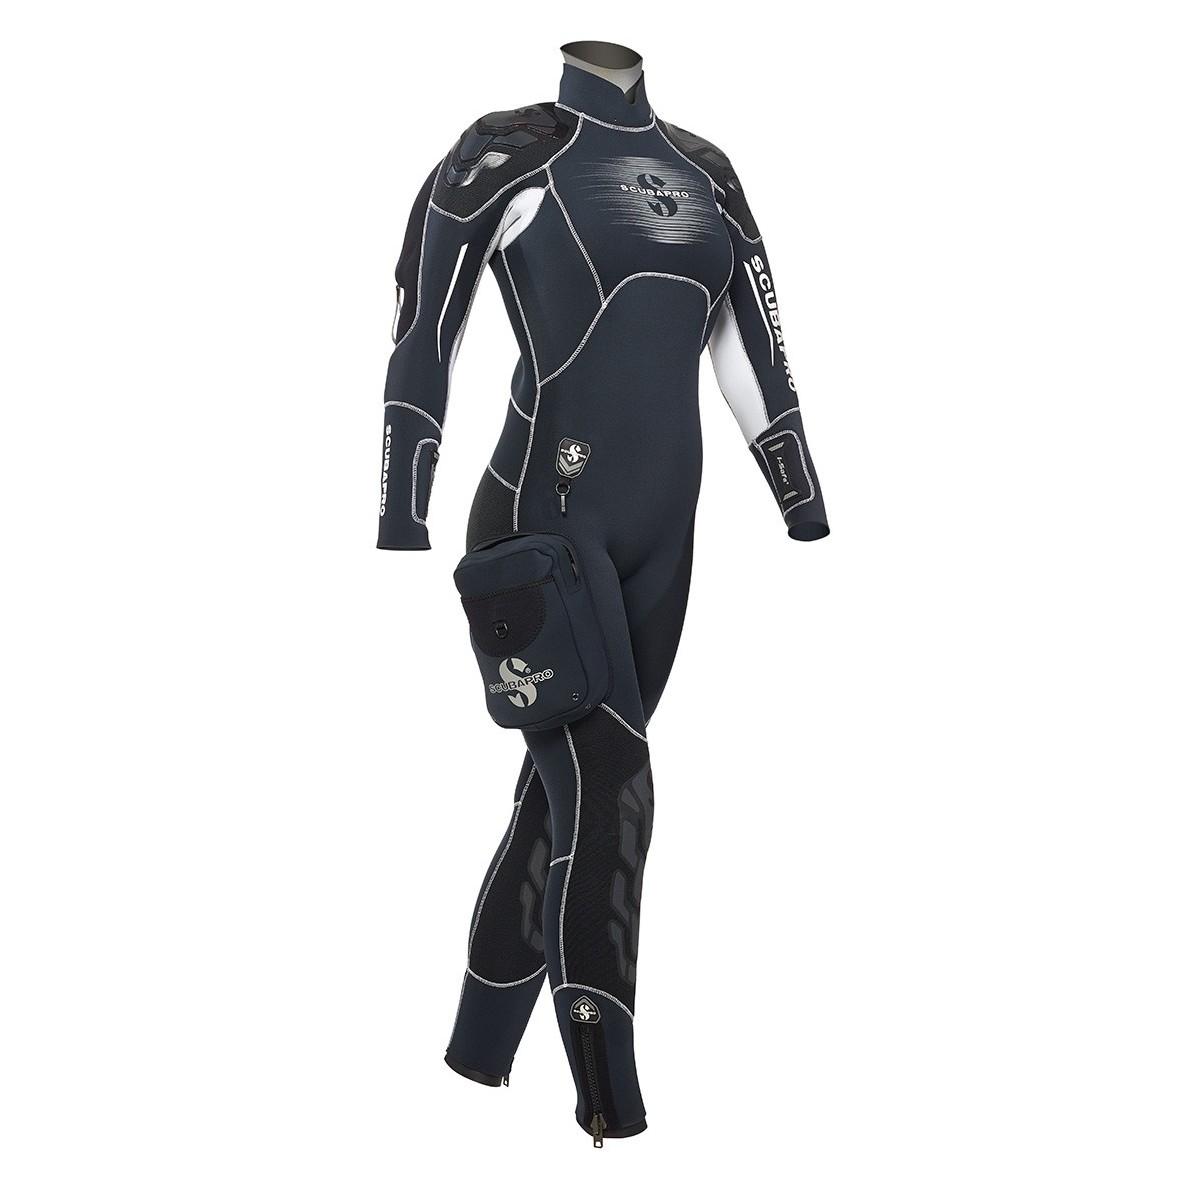 Scubapro Women's NOVA SCOTIA Semi-Dry 6mm Wetsuit